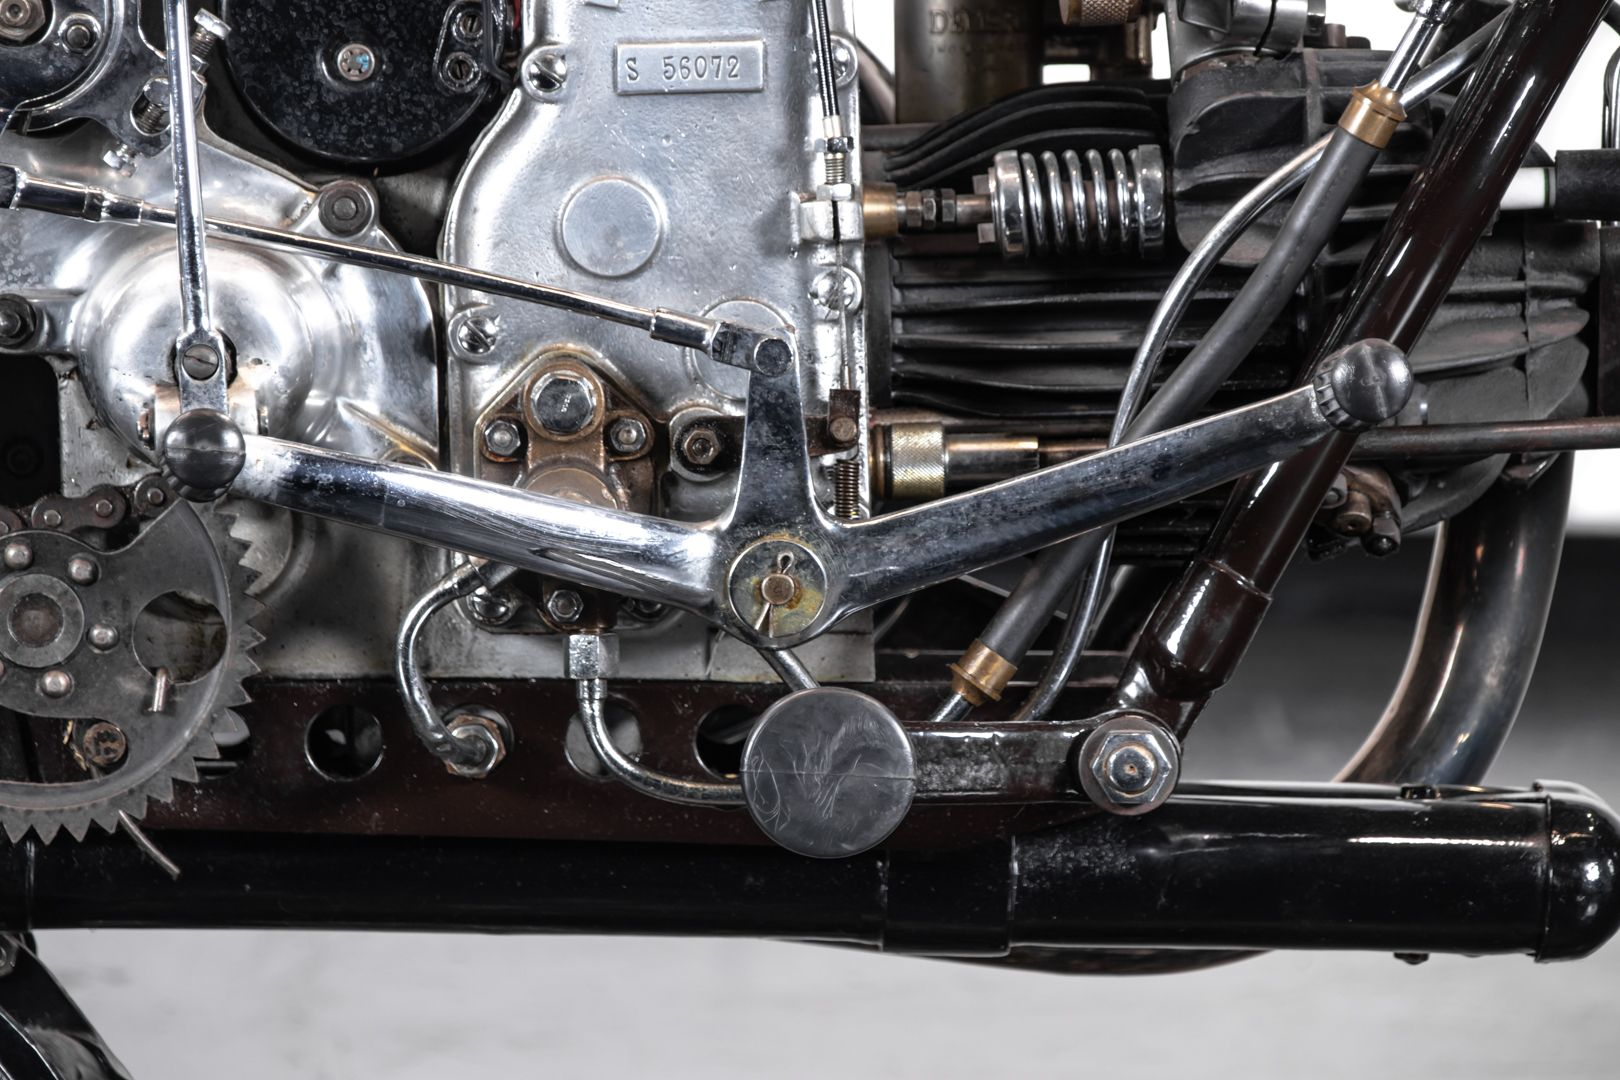 1951 Moto Guzzi 500 72187